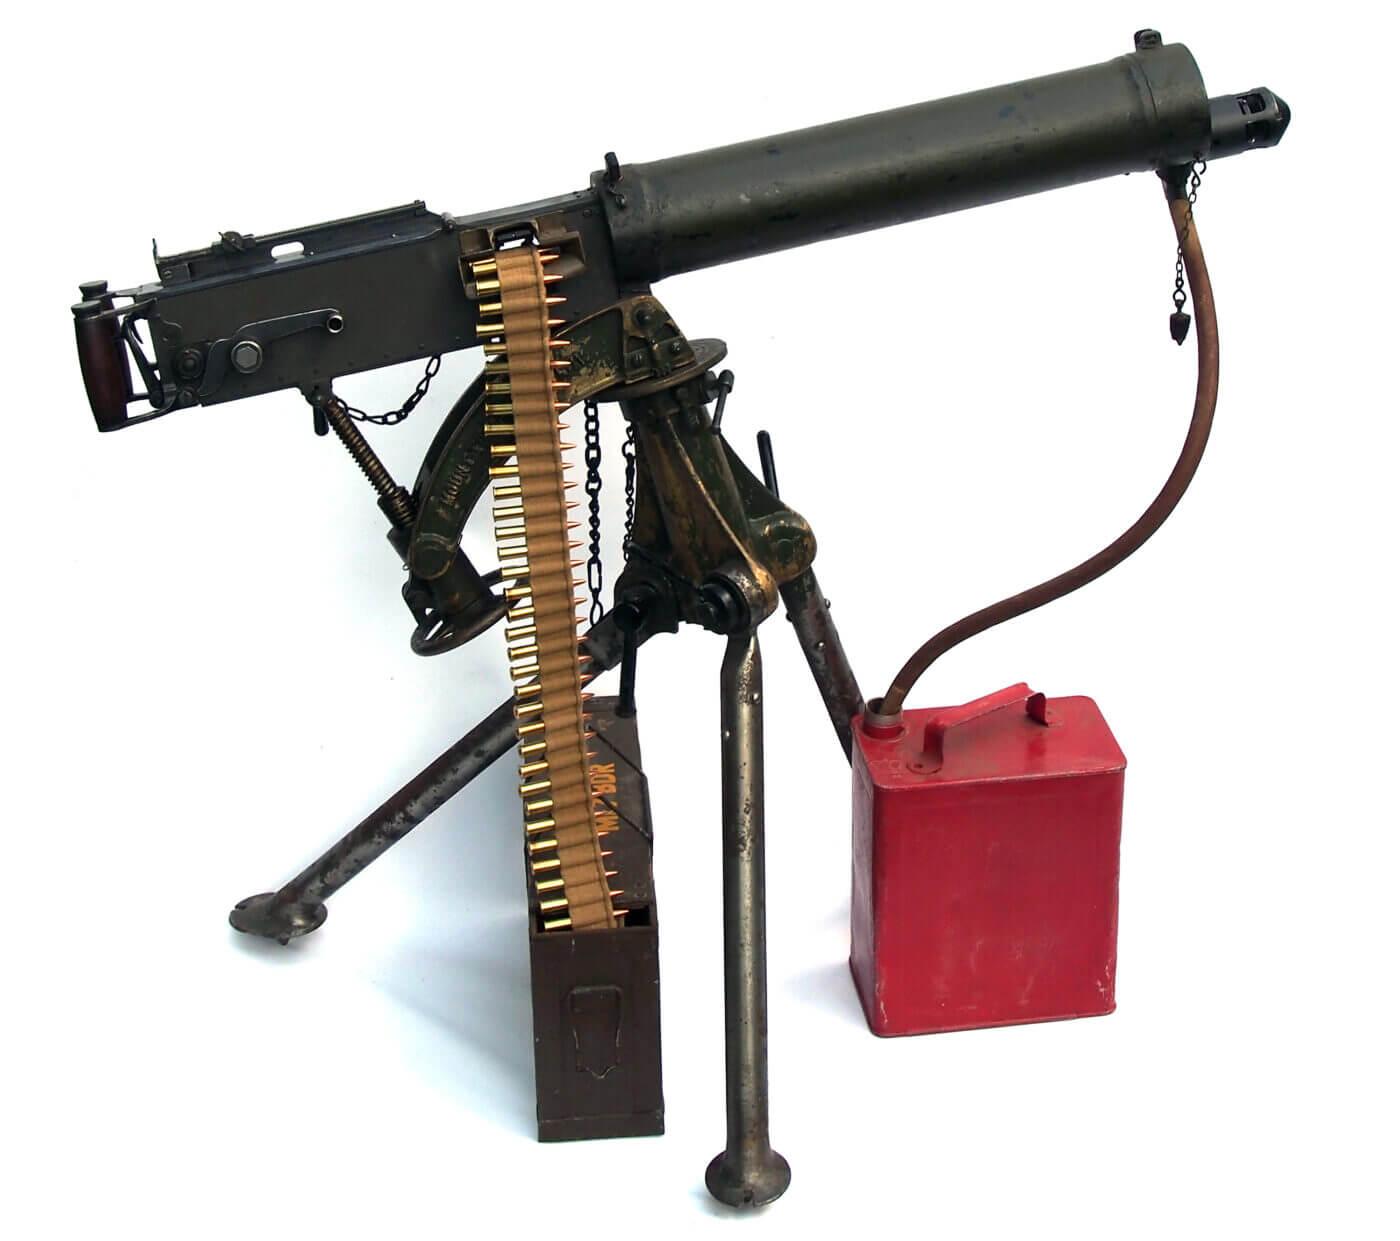 Vickers machine gun on white background